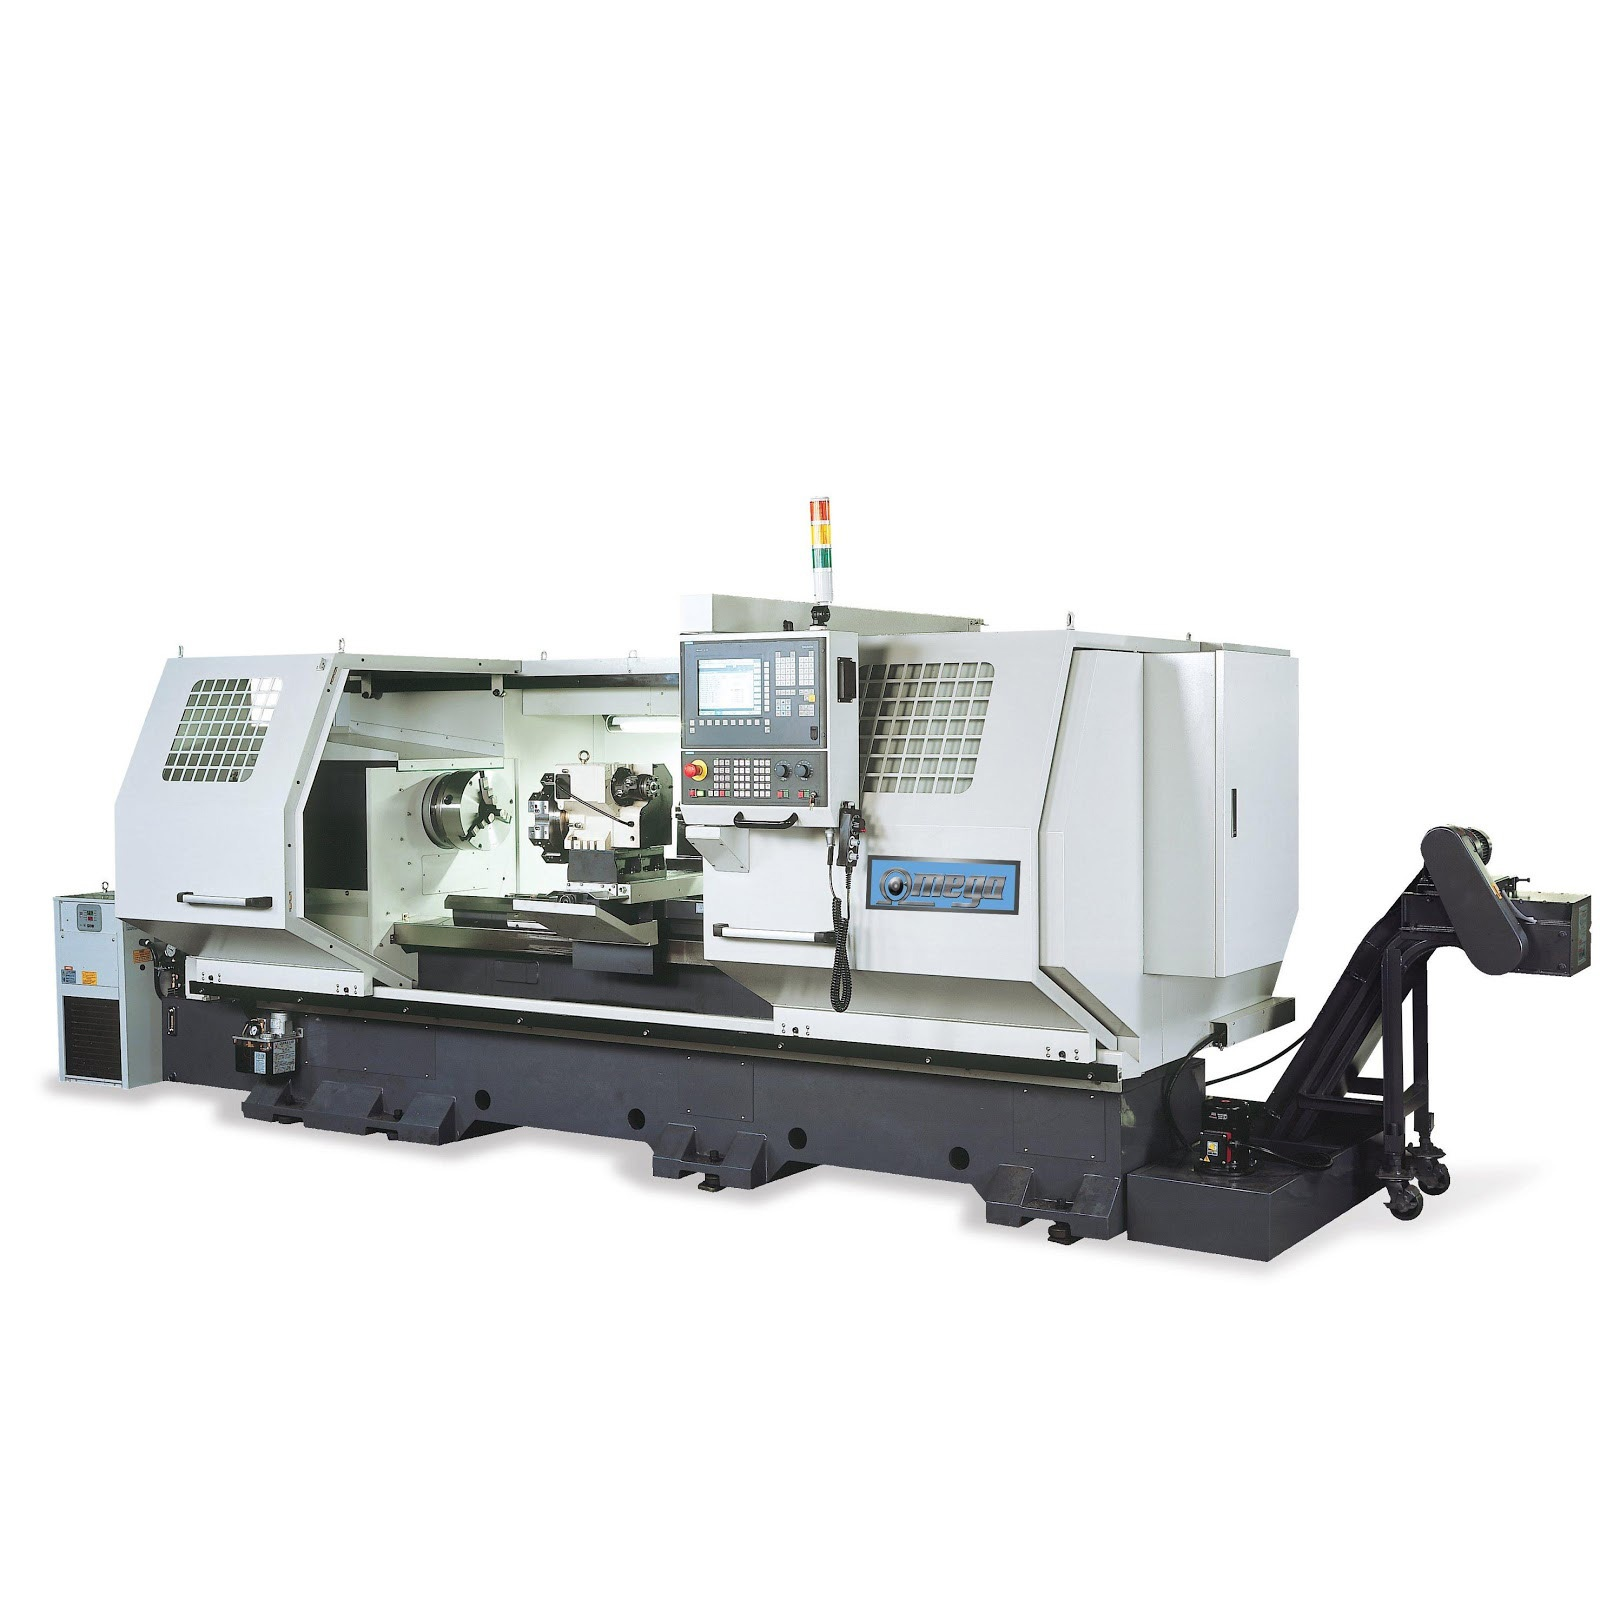 Omega Heavy Duty Precision CNC Lathe Model DL-660